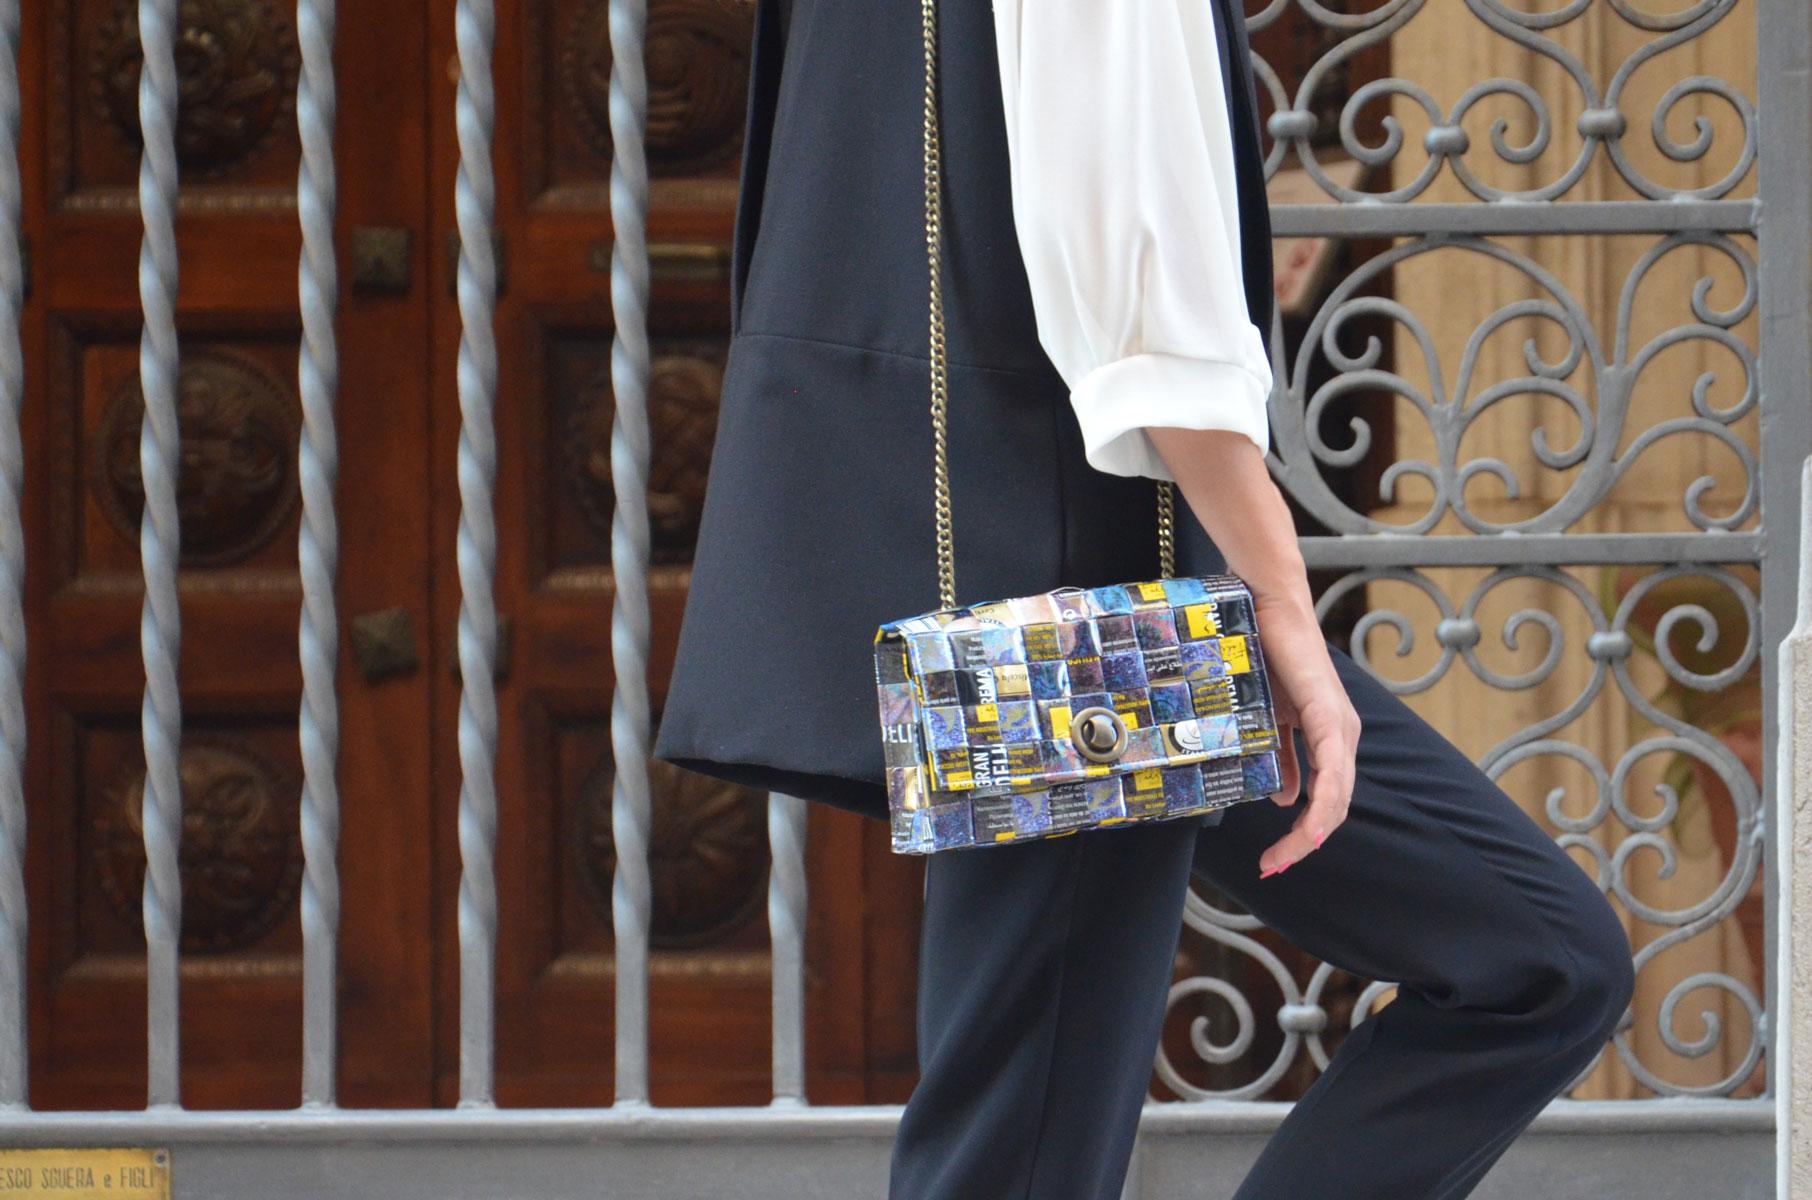 Meraky AROMA collection Espresso sac chatelaine bag bouquet